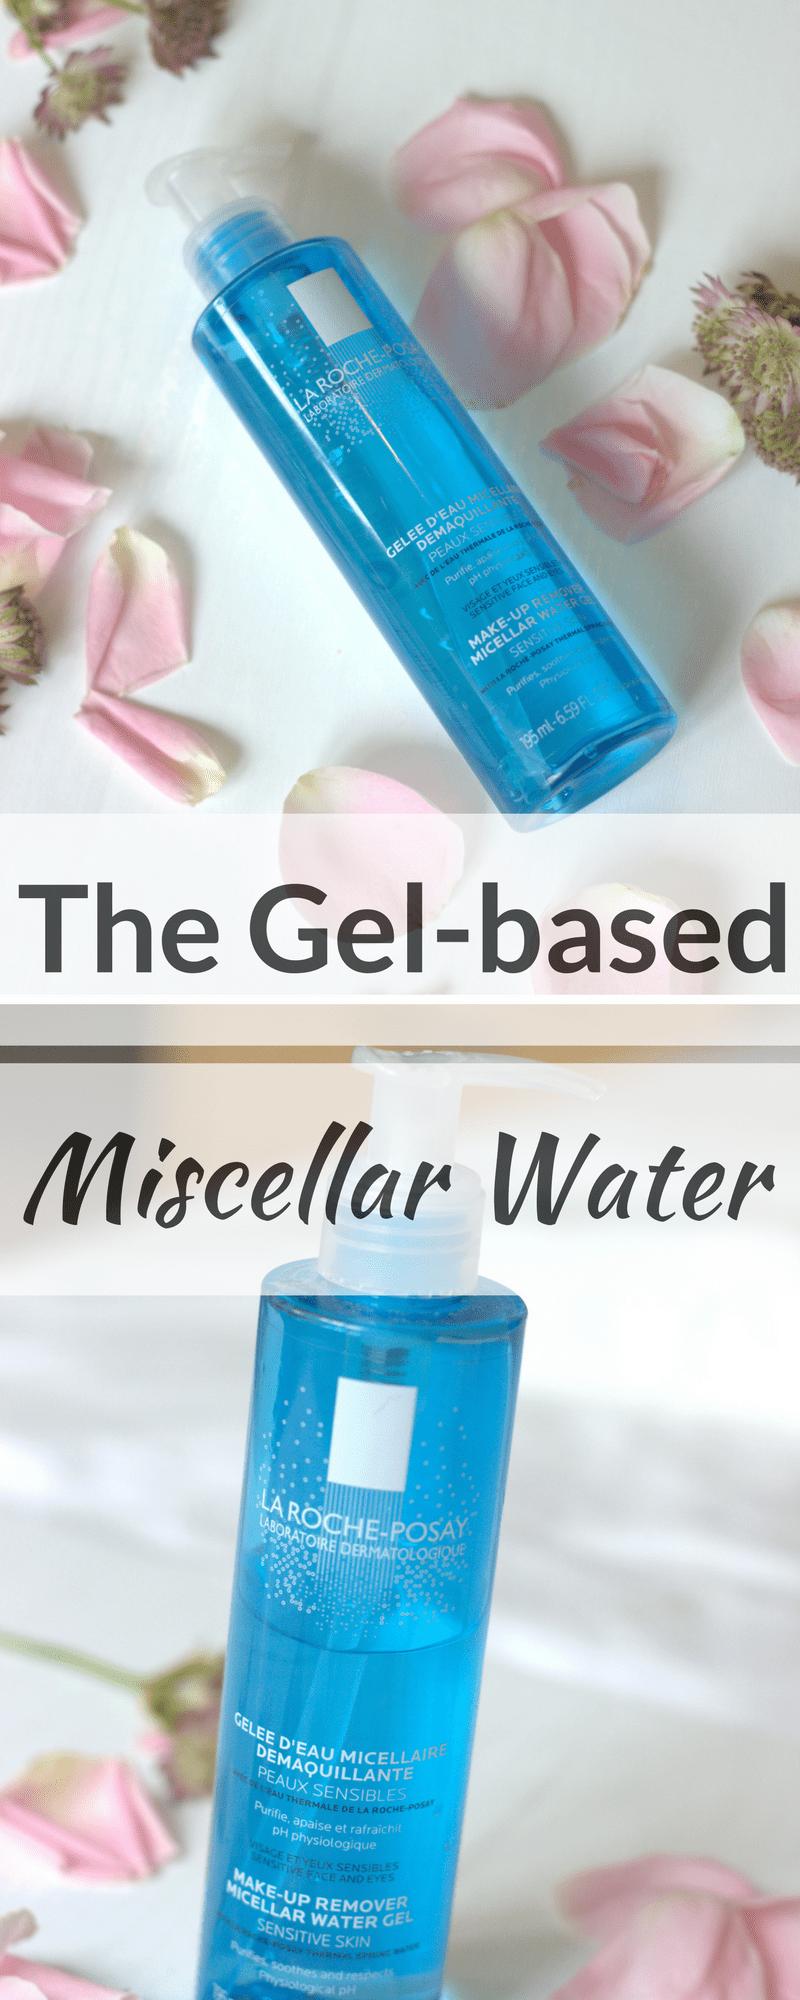 La Roche-Posay Micellar Water Gel Review